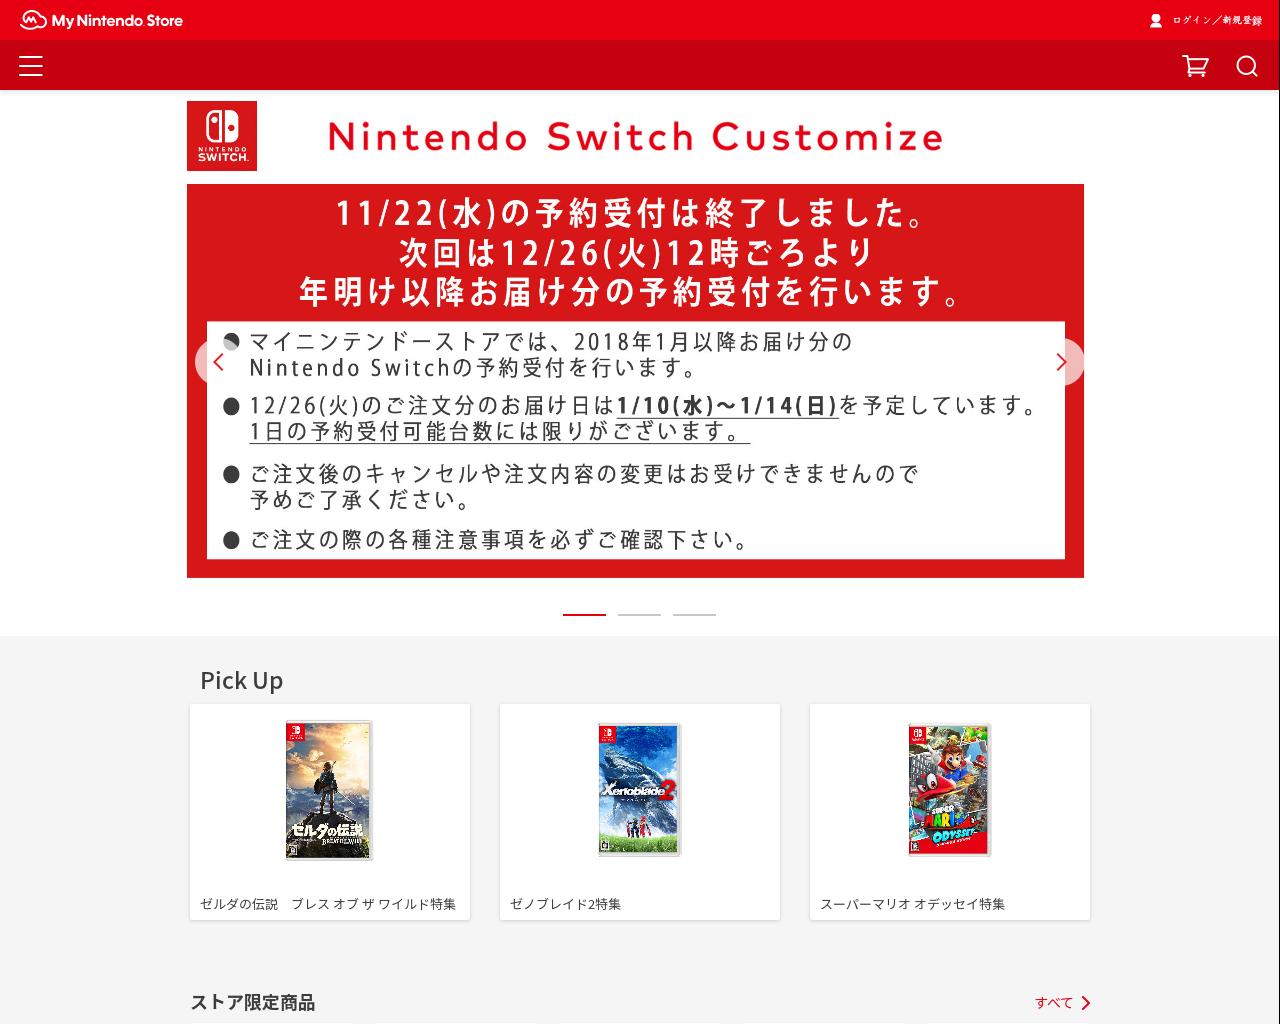 store.nintendo.co.jp(2017/12/01 17:40:24)